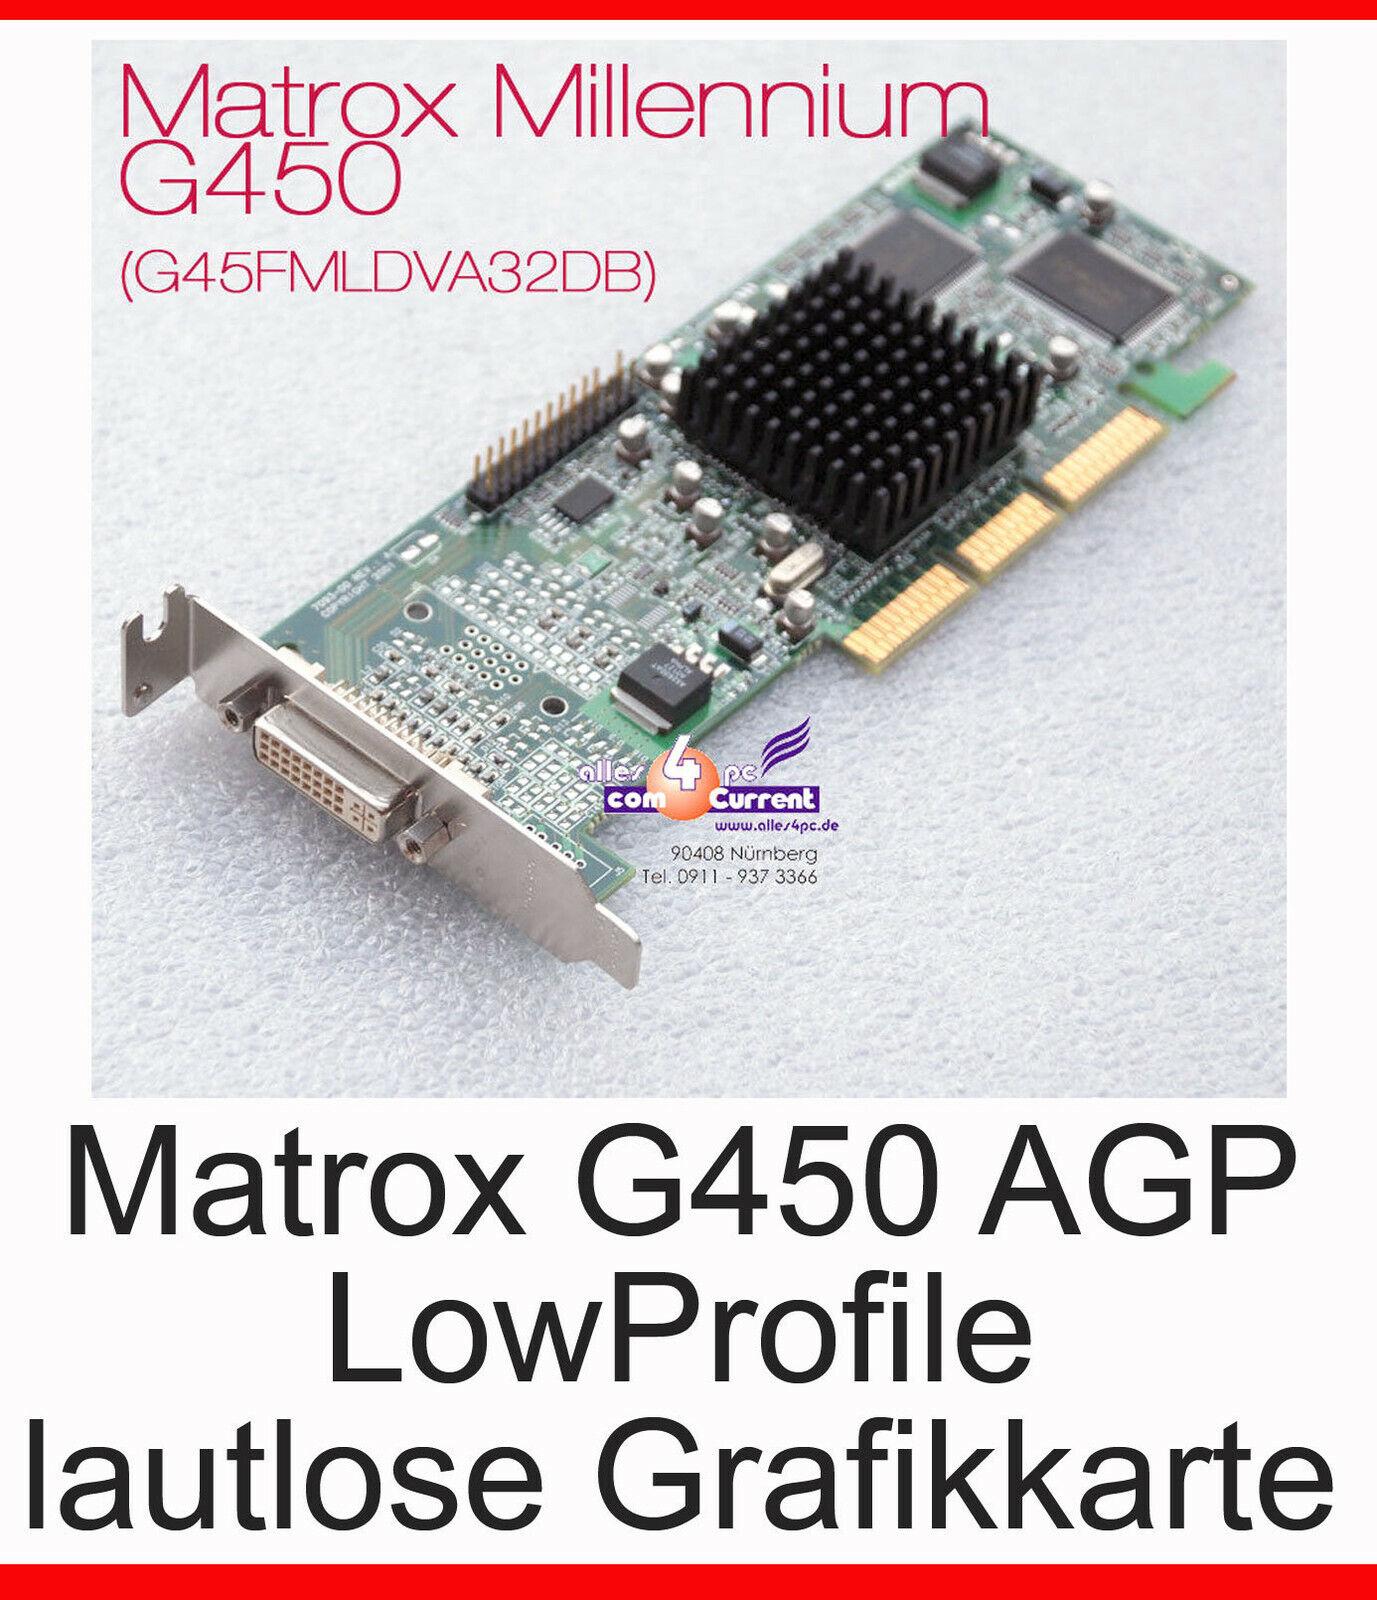 Low Profile SFF Silent Graphic Card Matrox AGP DVI G450 32MB Passivcooler #G21